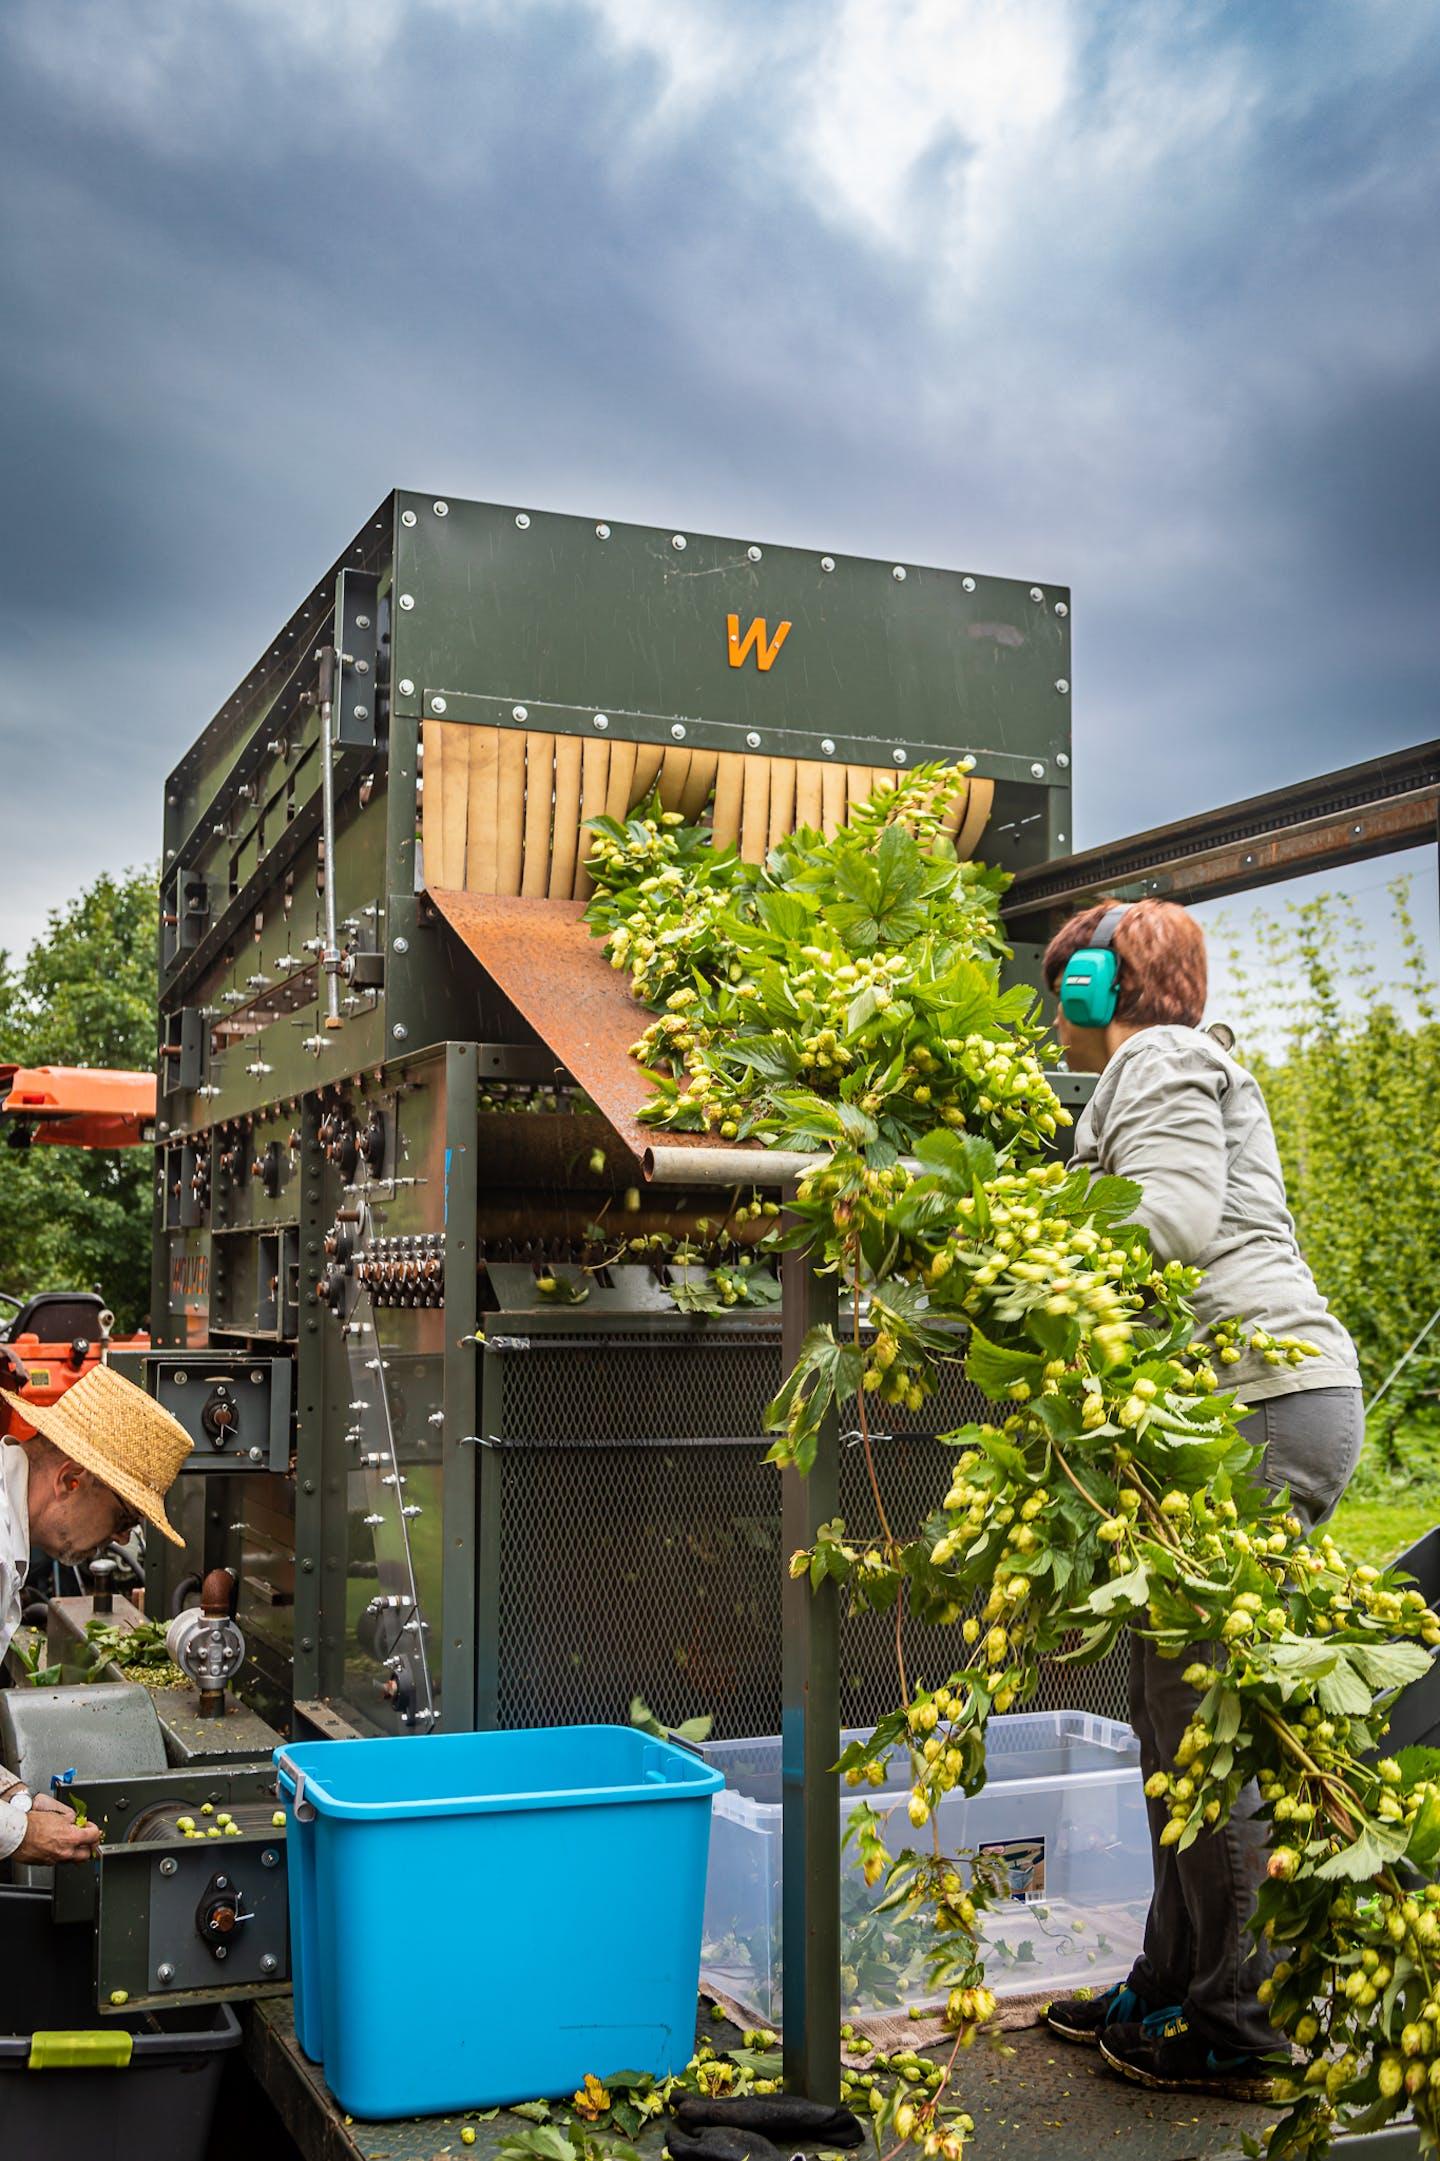 Whitefield Wet Hops lg 20190830 016